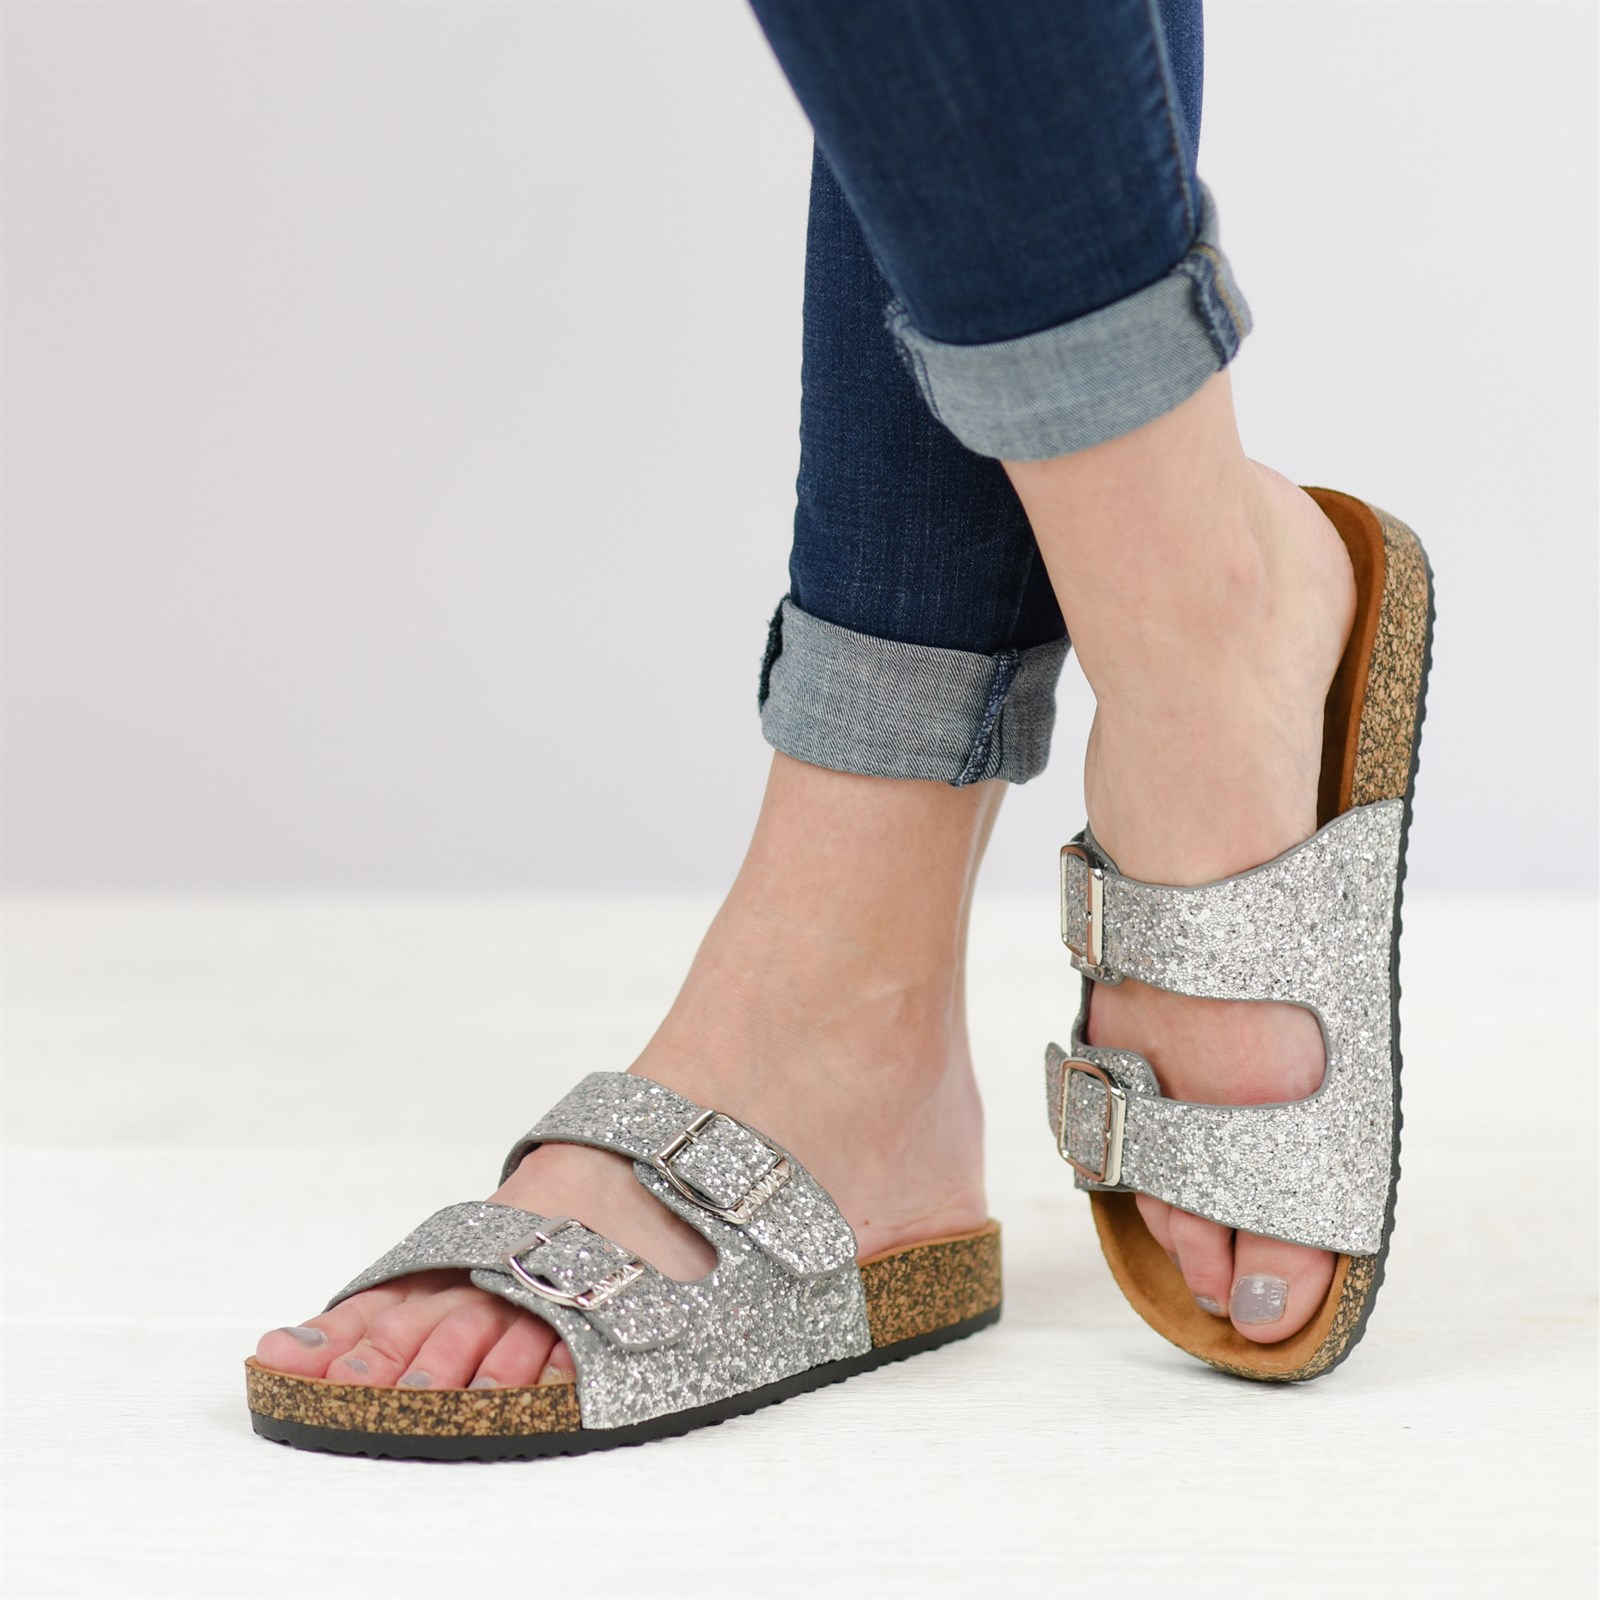 Slip-on Glitter Two-Strap Sandals | Jane